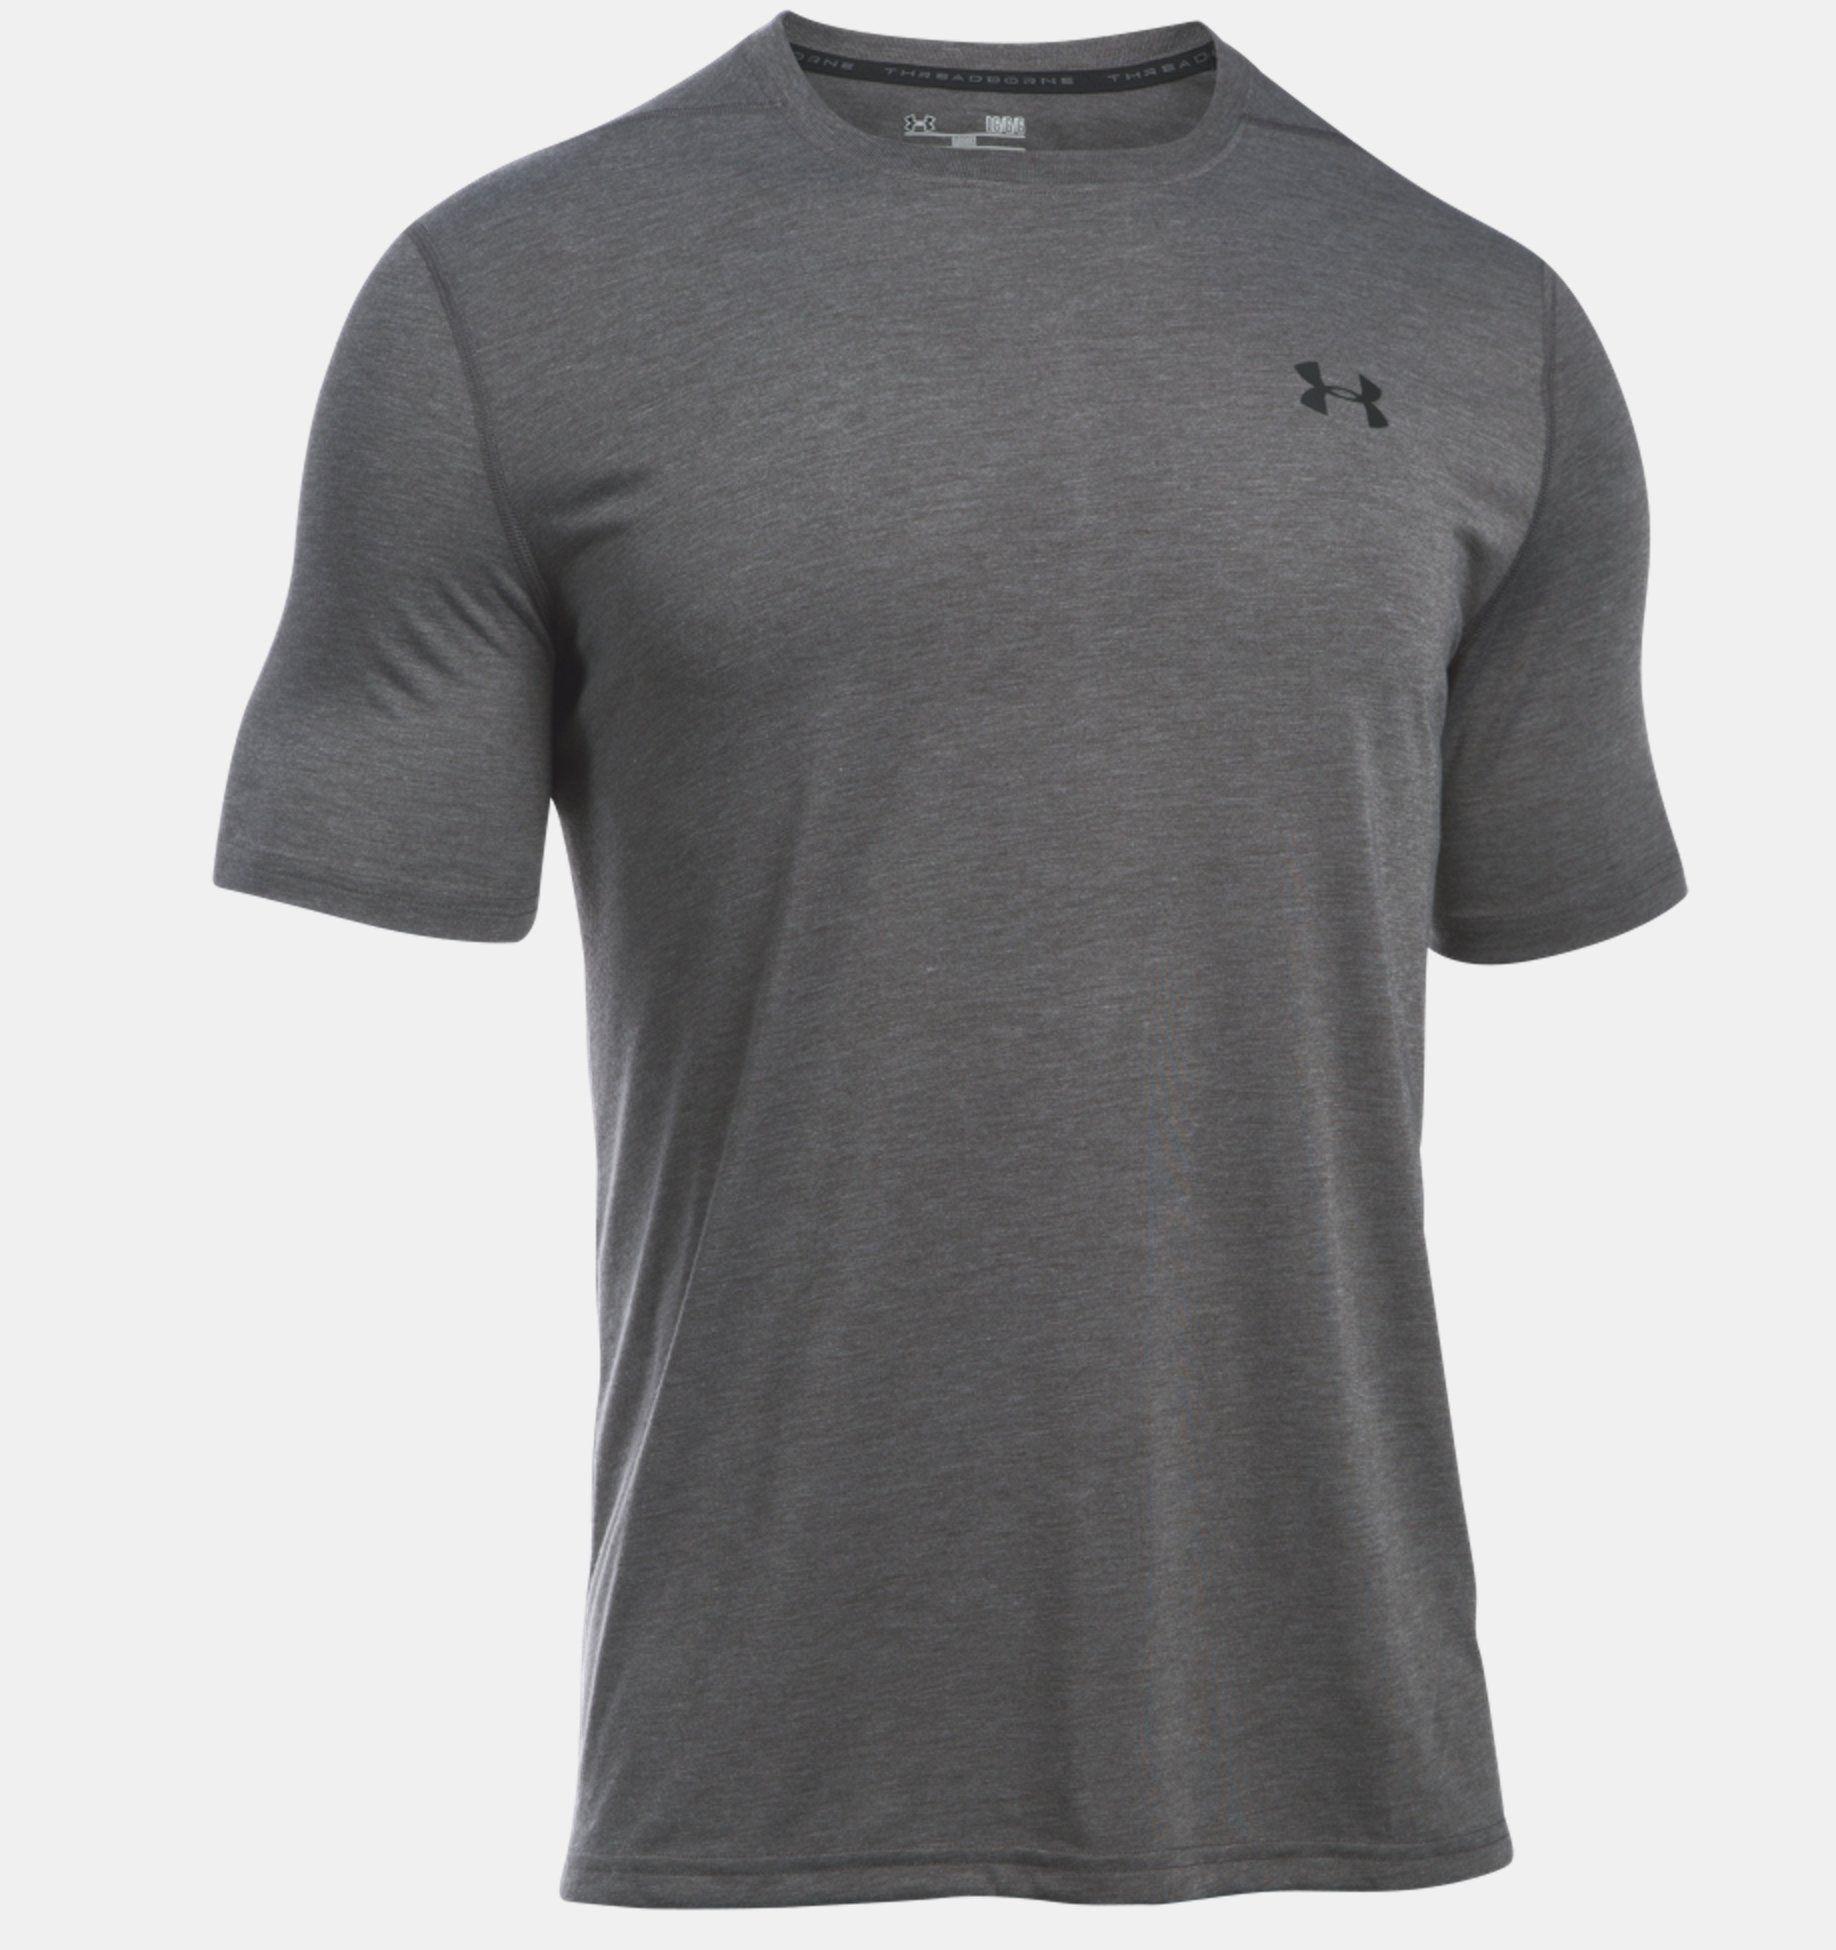 Camiseta Masculina Under Armour Threadborne